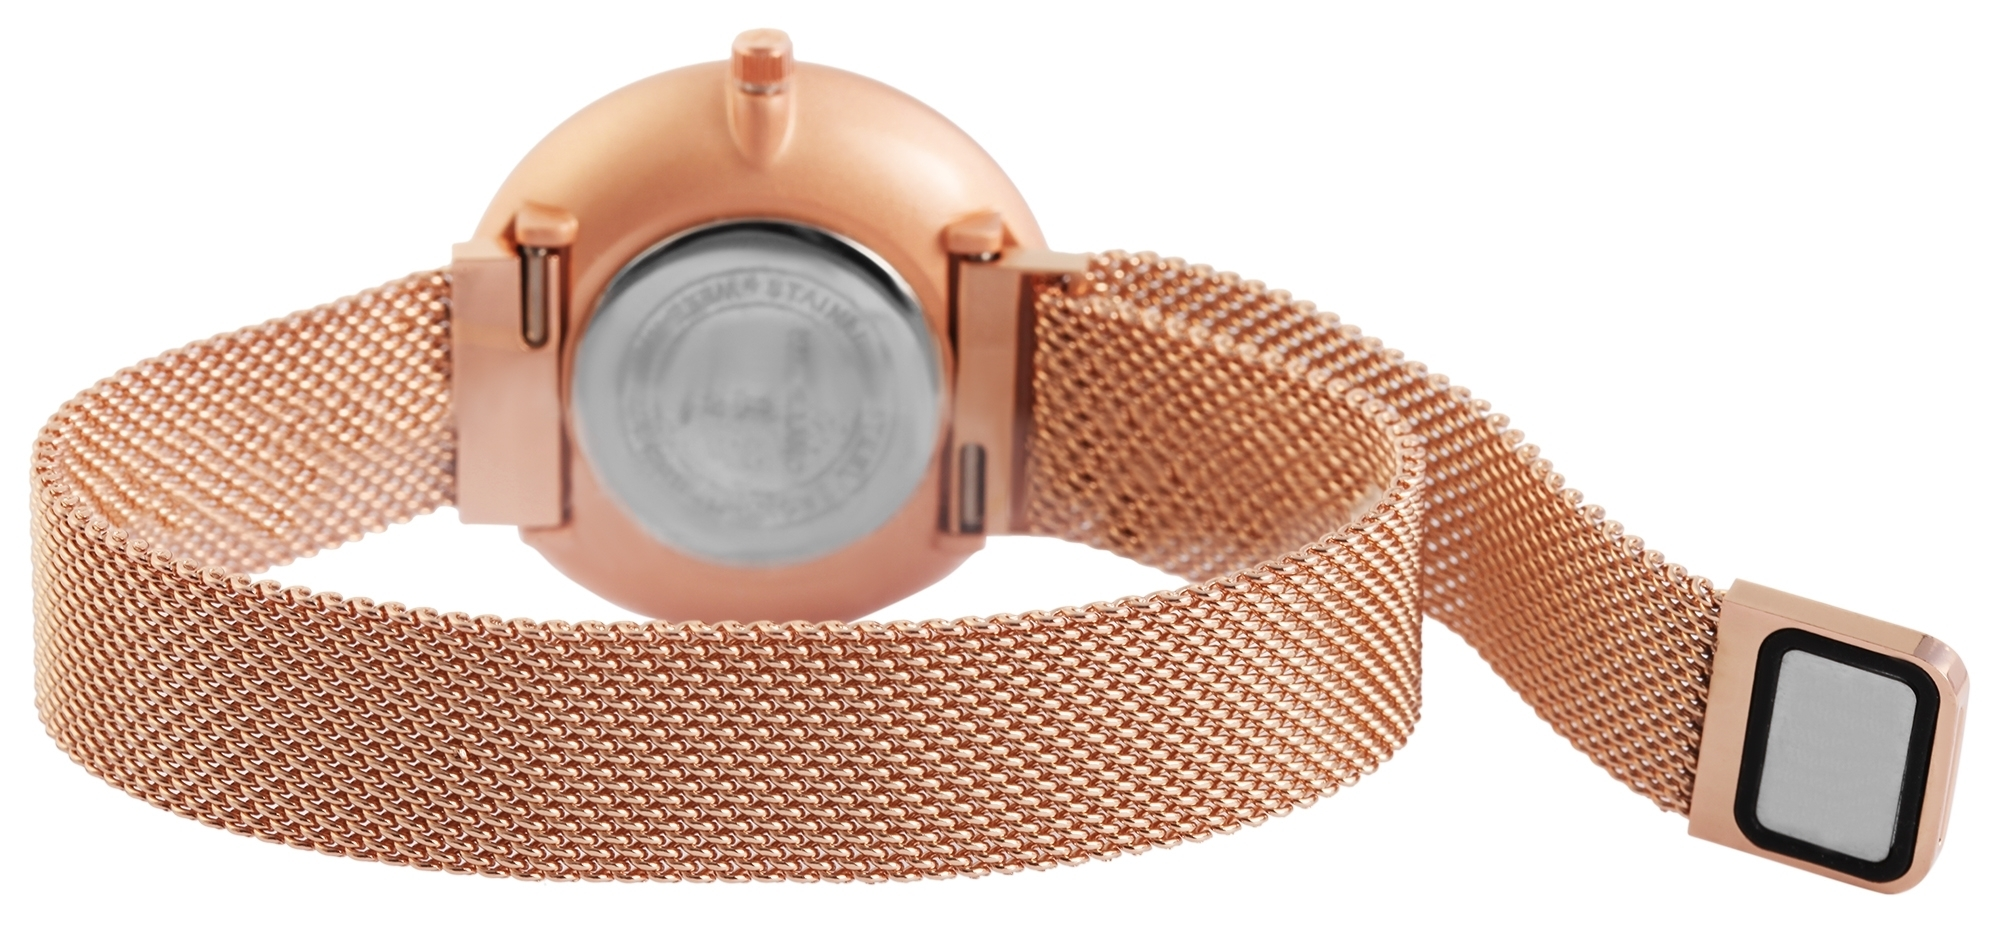 Damenuhr Excellanc Armbanduhr Meshband Magnetverschluss rose weiss